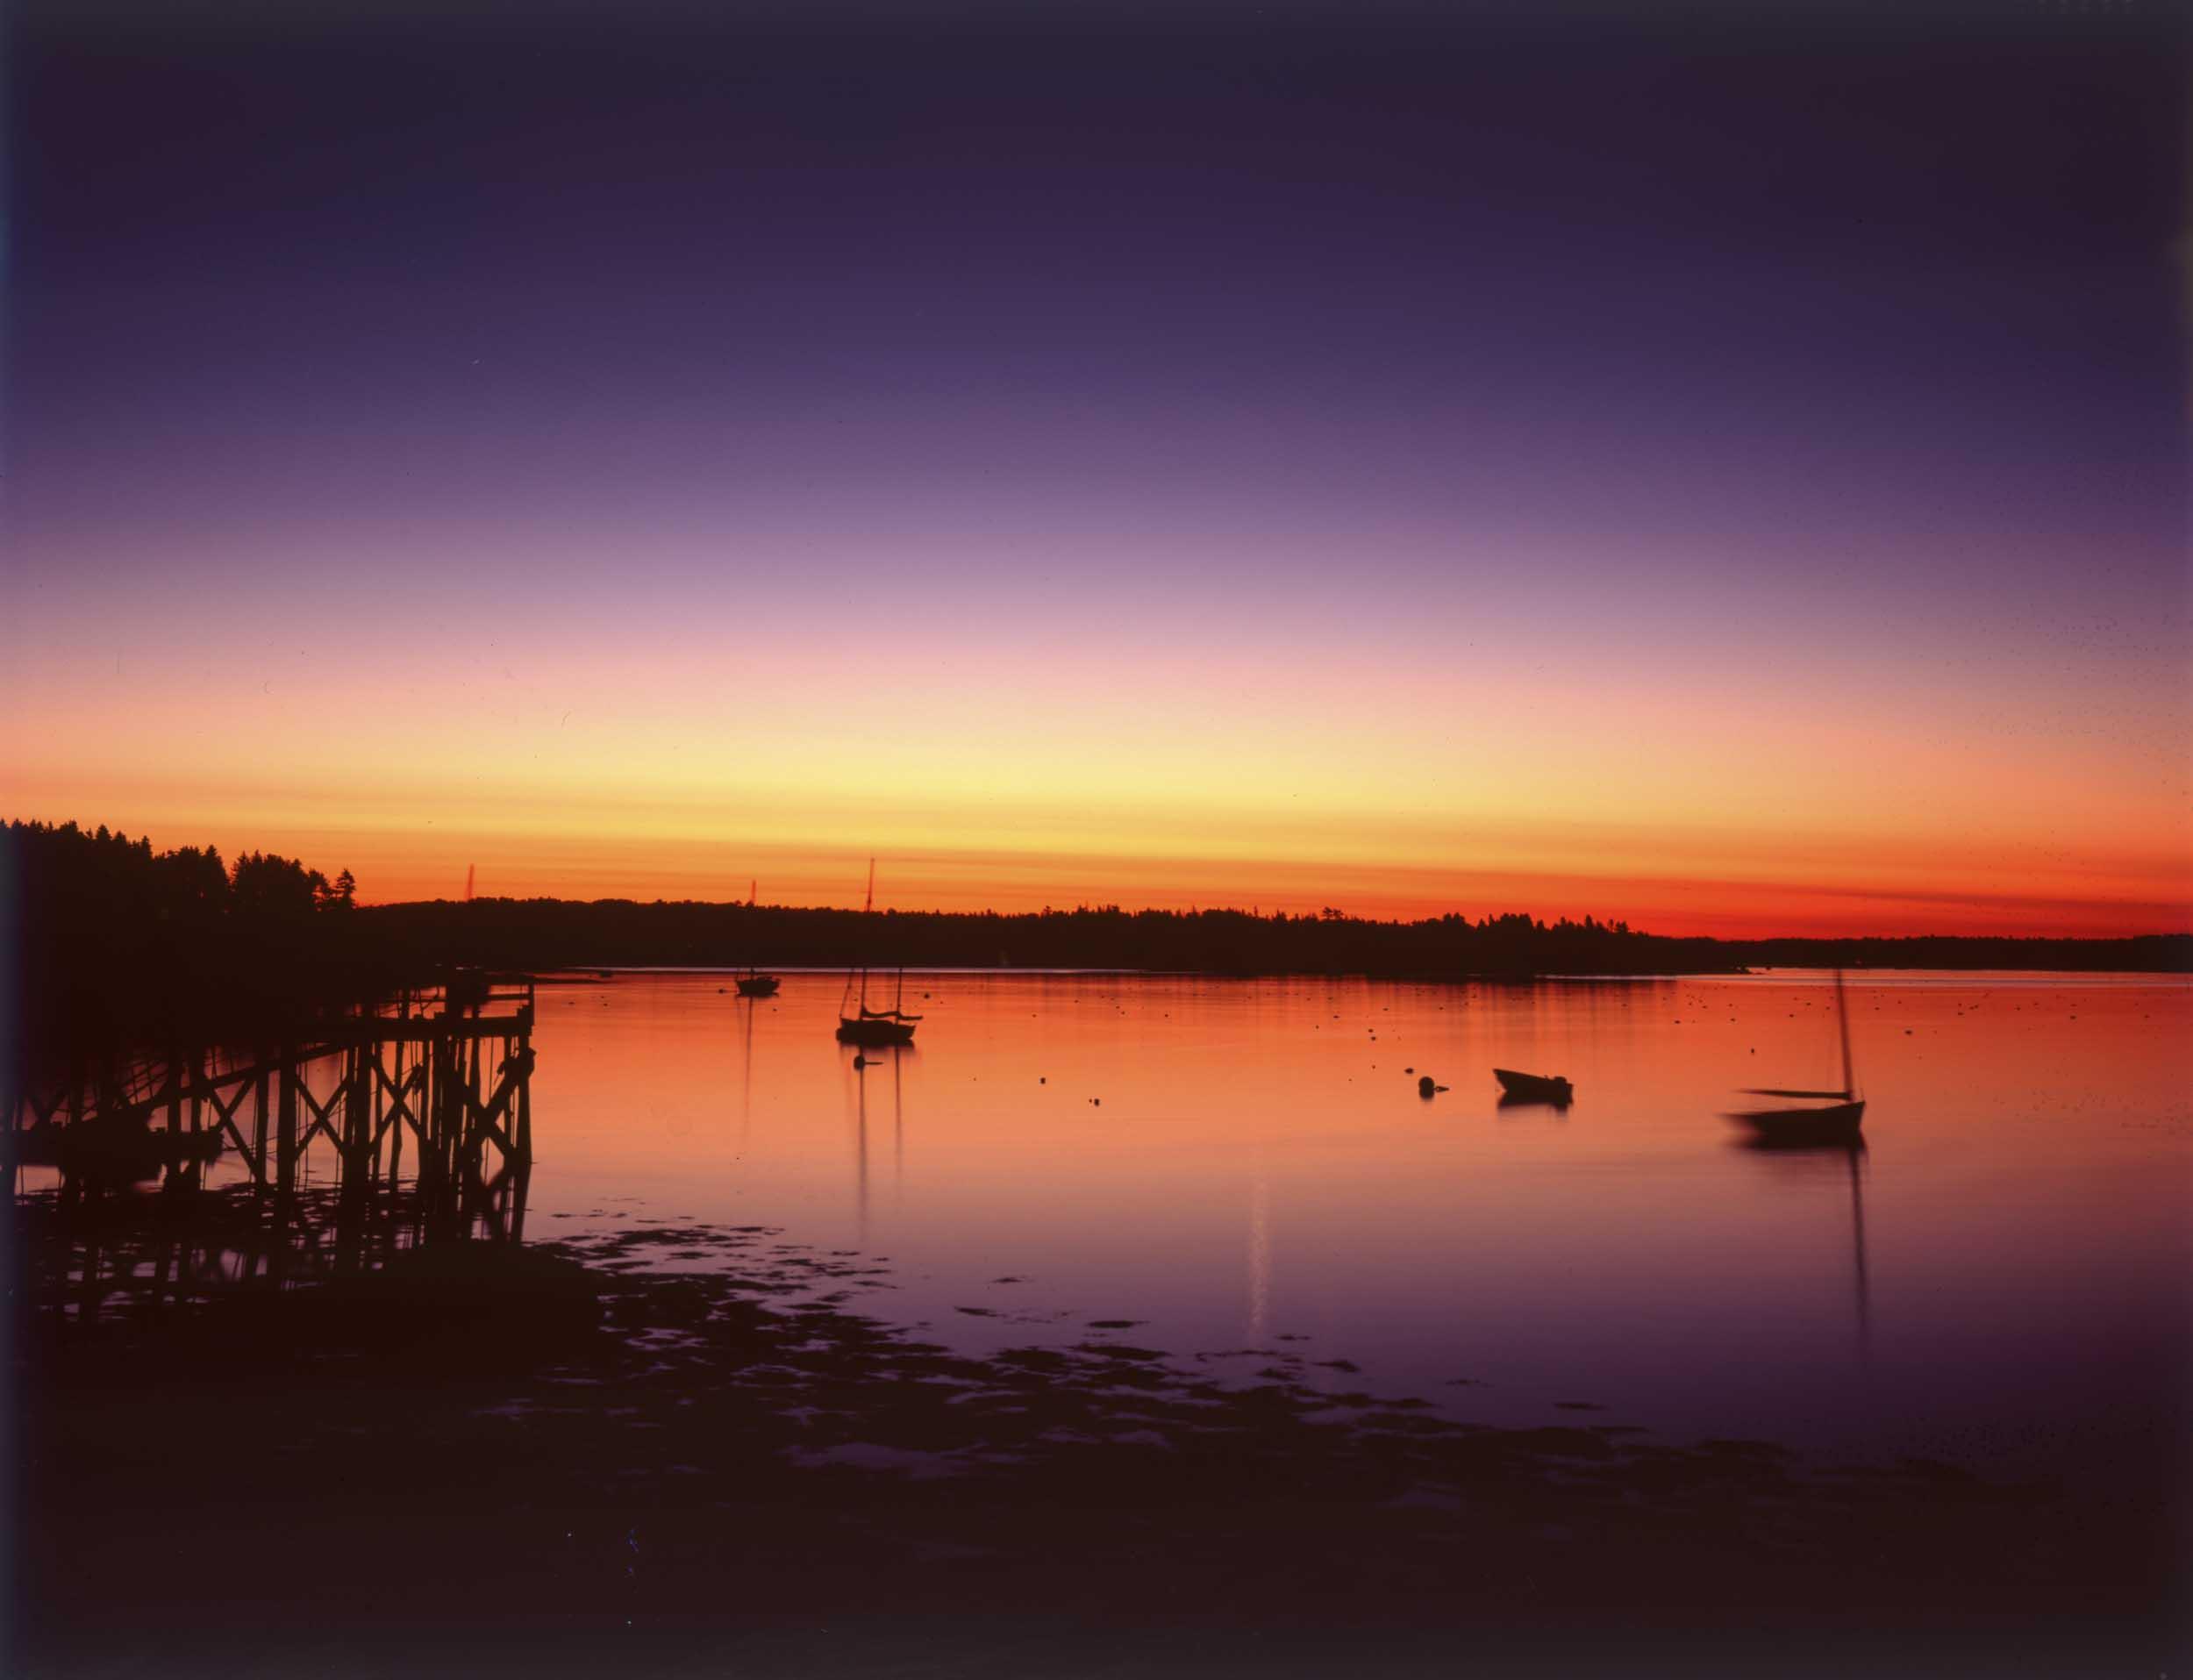 Dawn,<br>Friendship, Maine